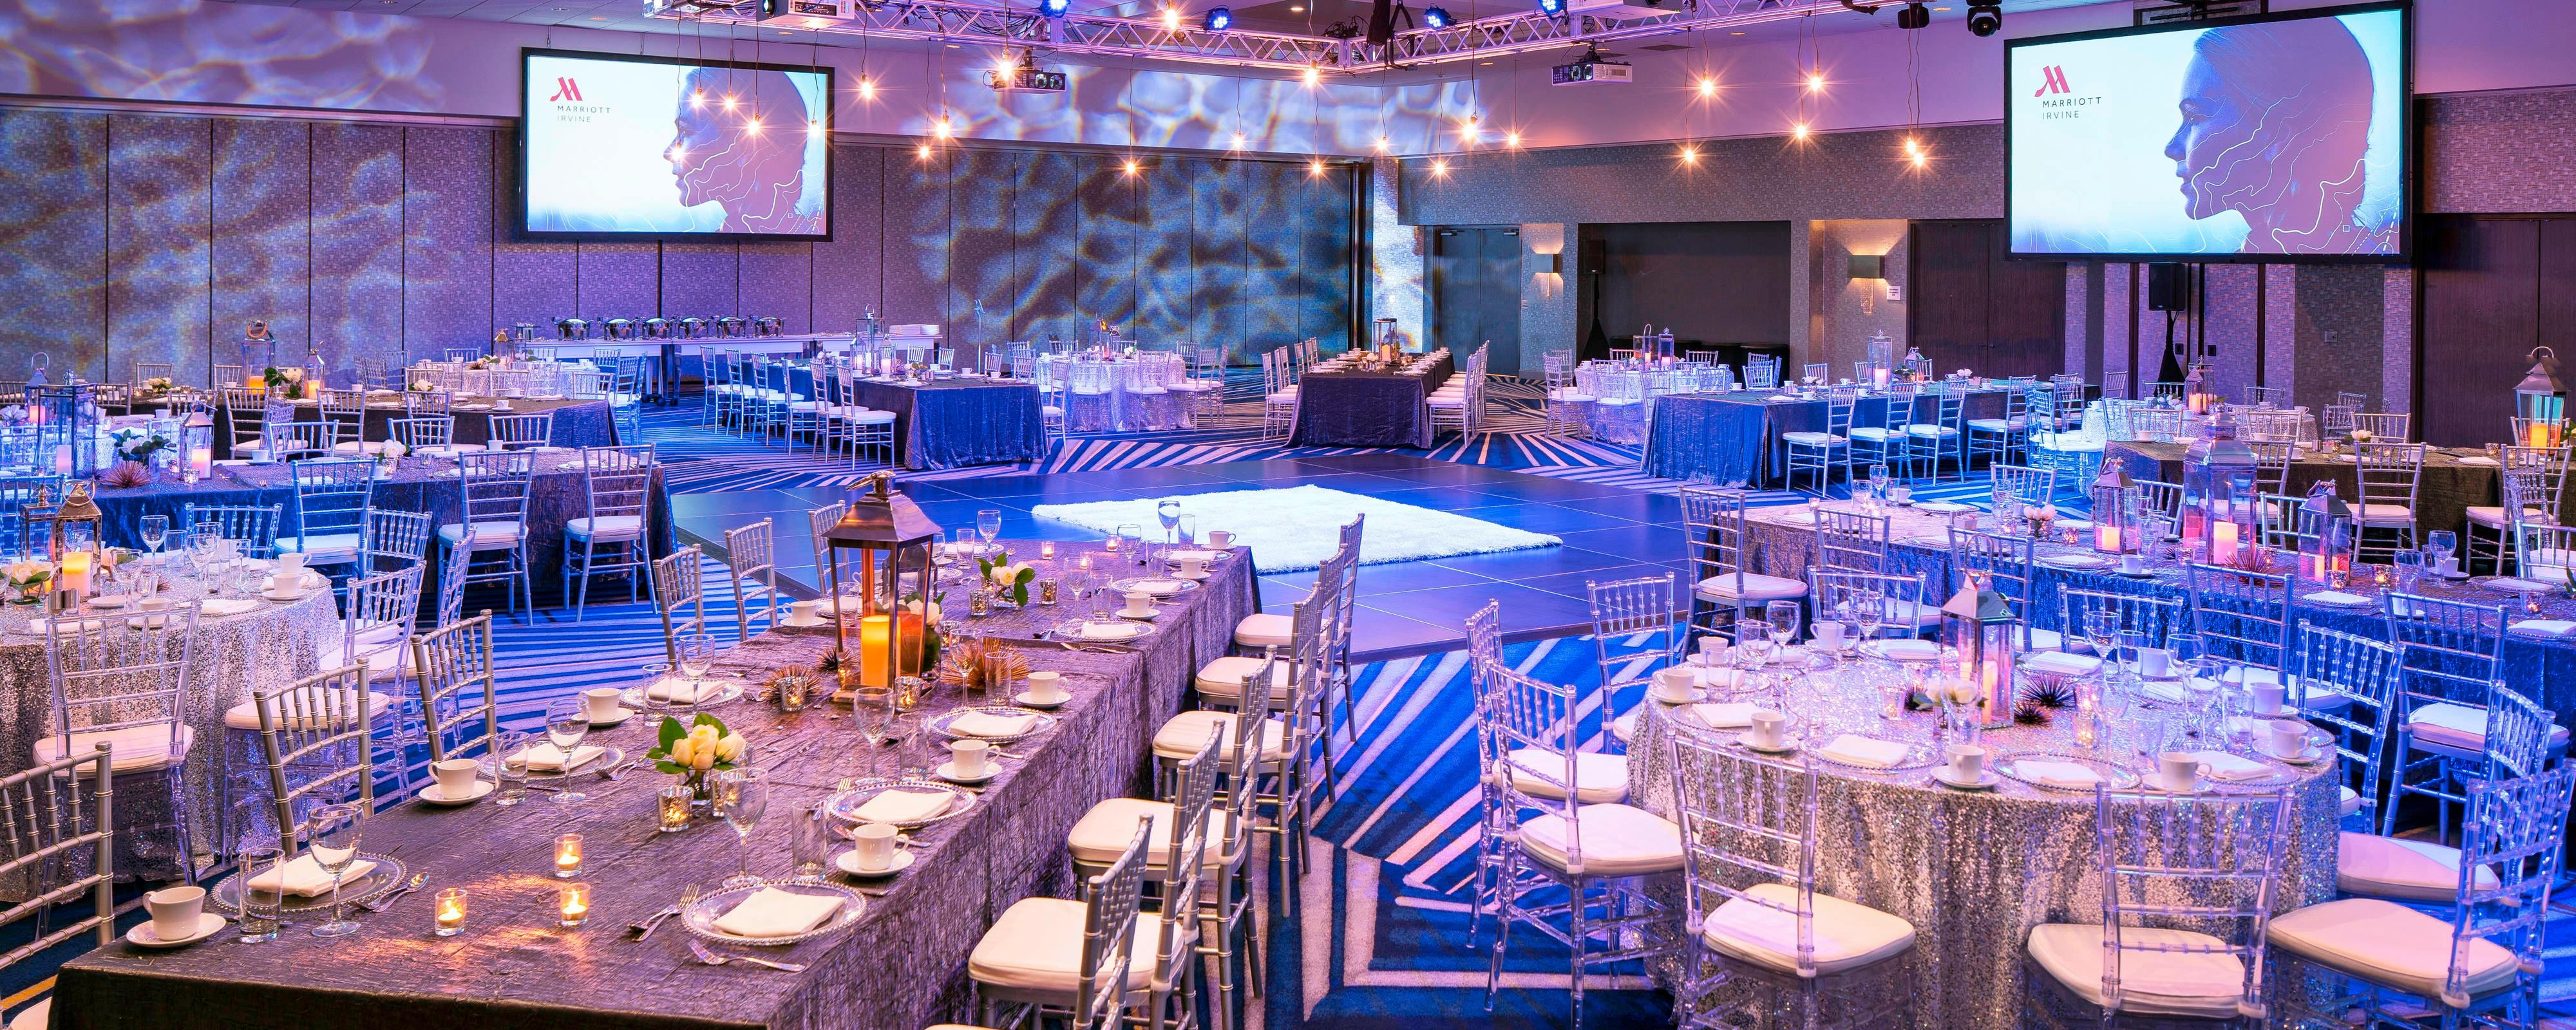 Irvine ca wedding reception venues irvine marriott view photos junglespirit Images